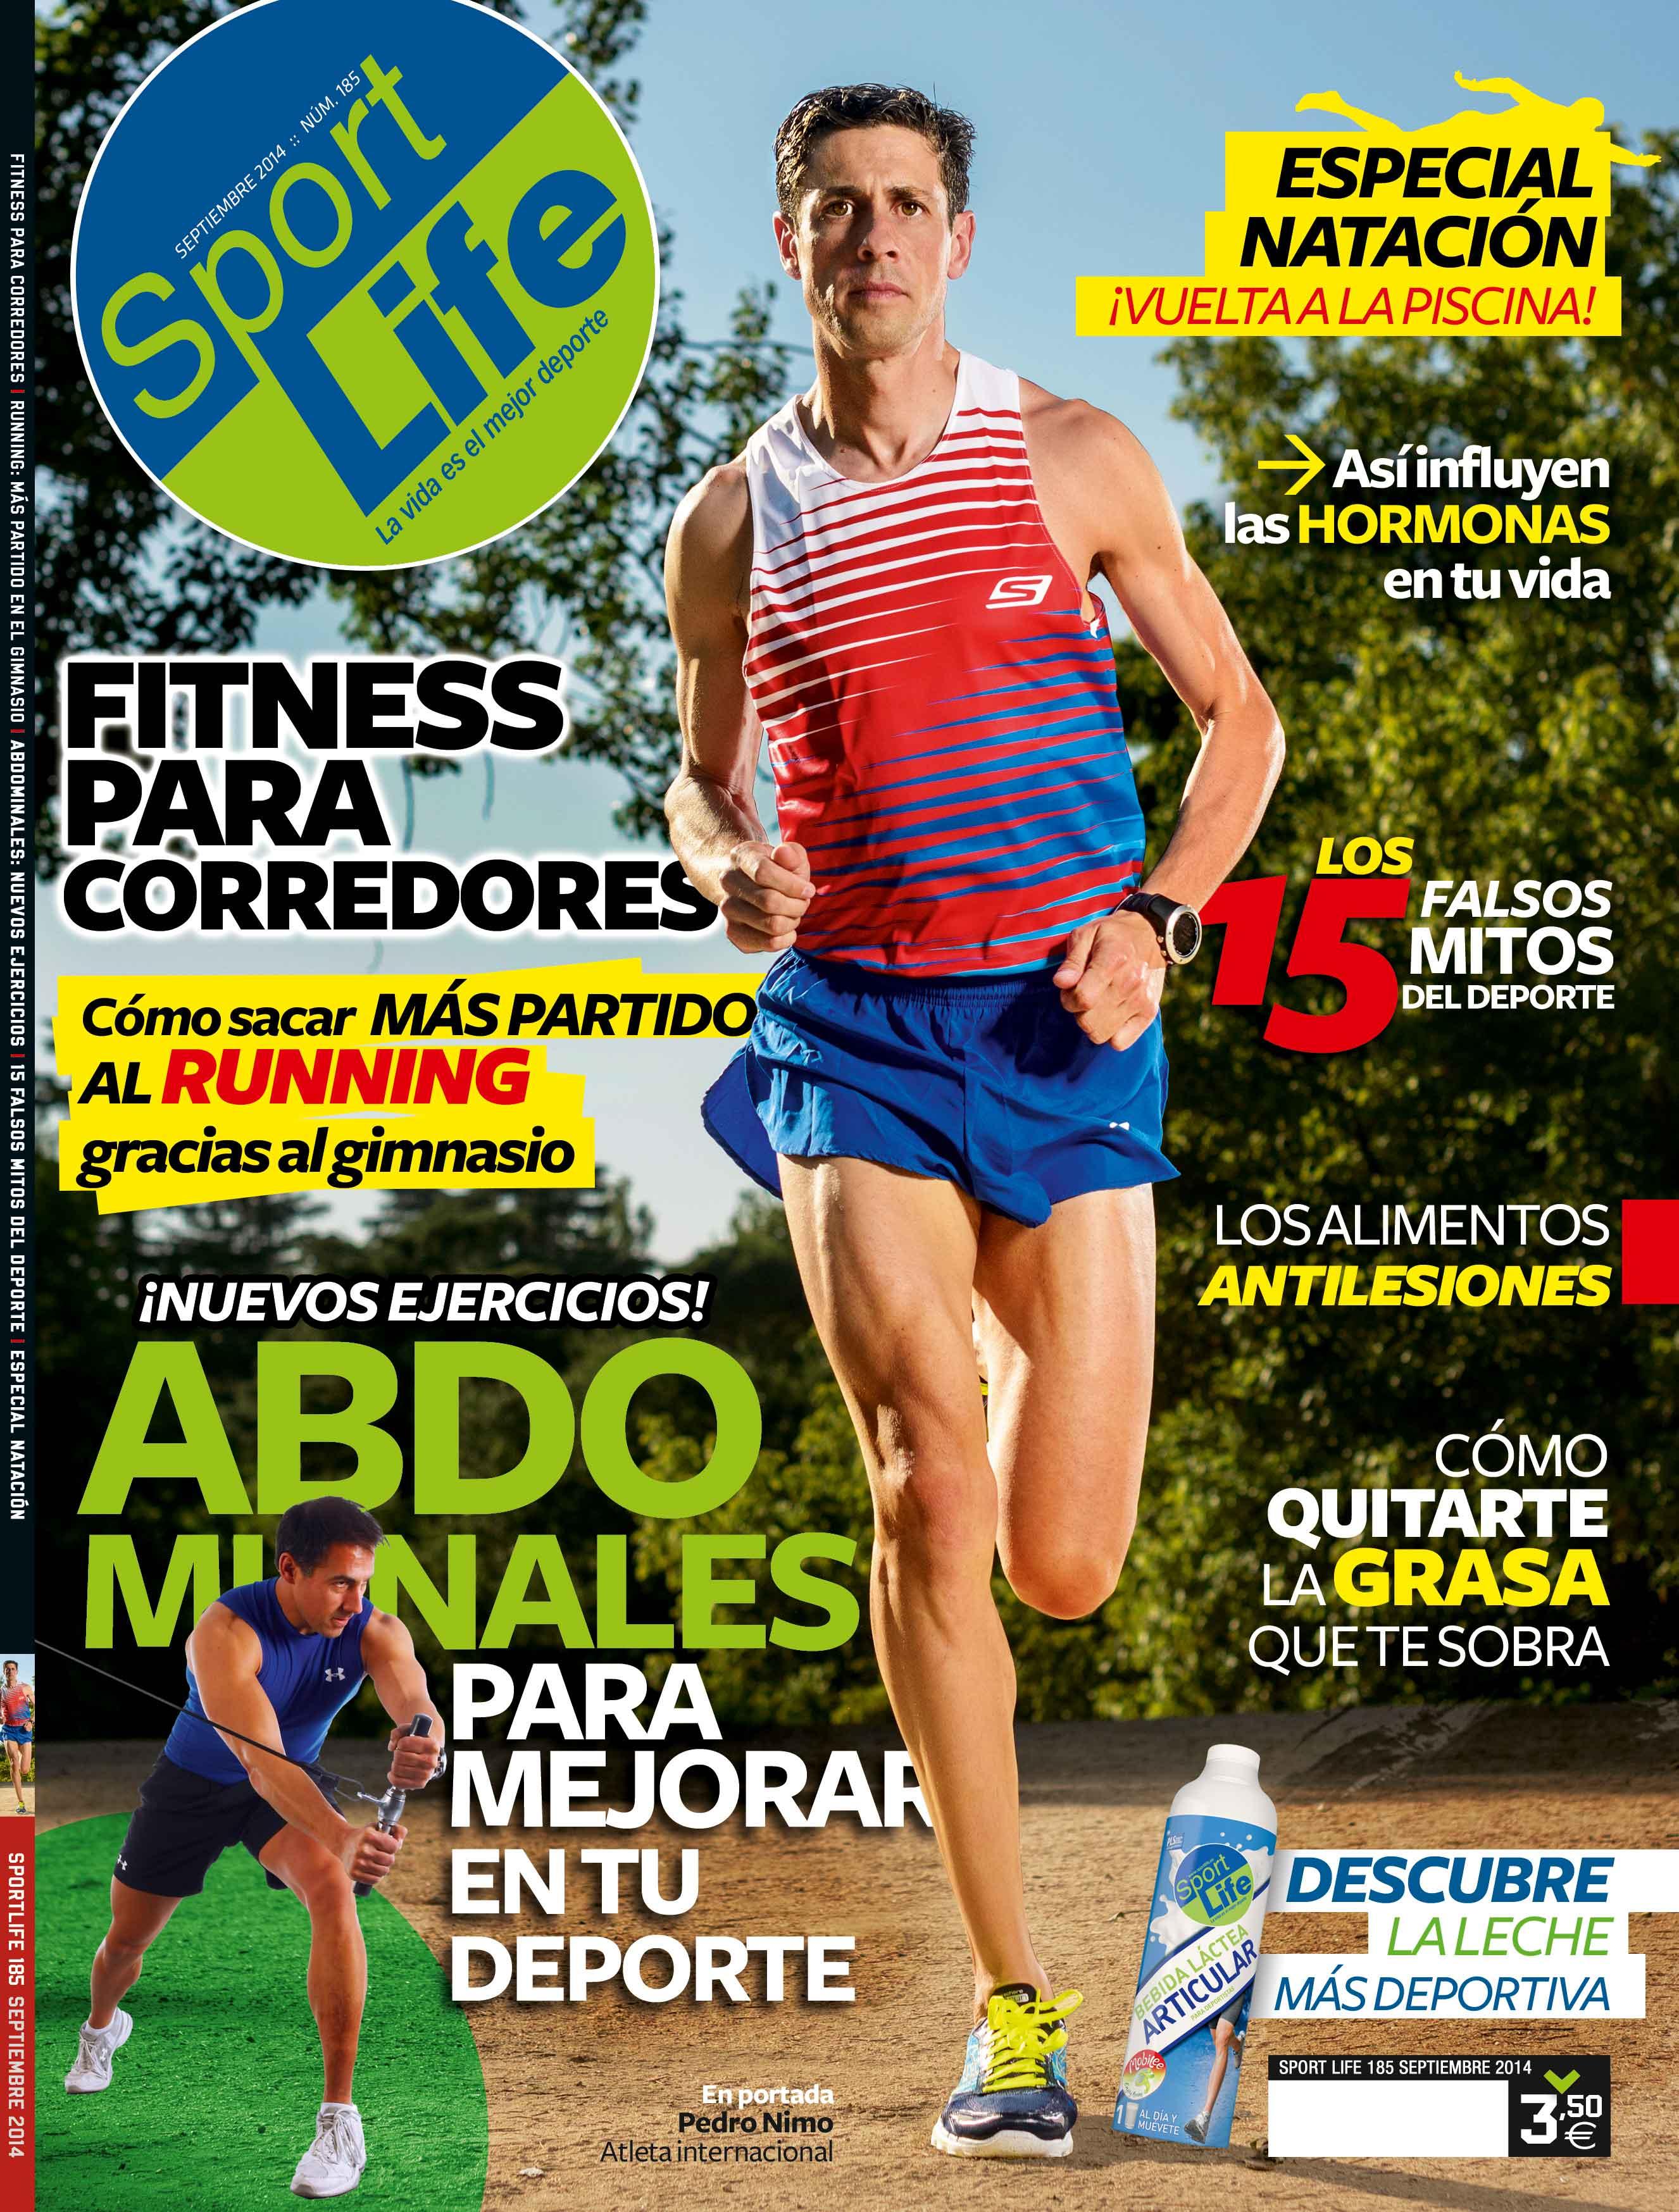 Sumario Sport Life 185 Septiembre 2014